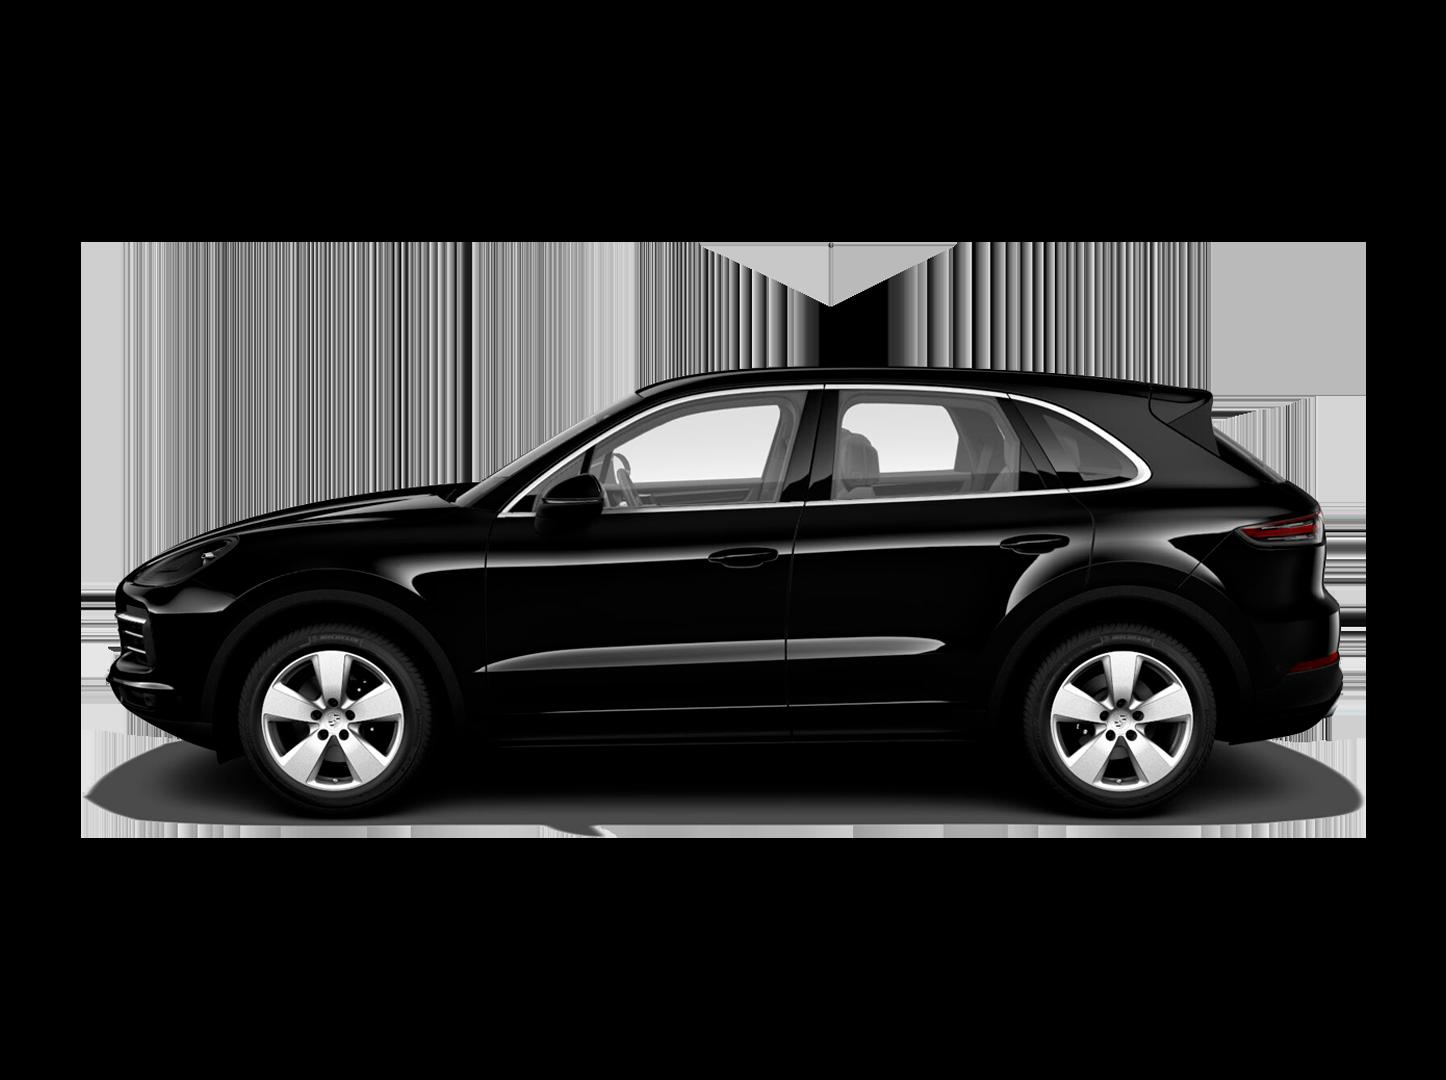 3.0 V6 GASOLINA AWD TIPTRONIC S